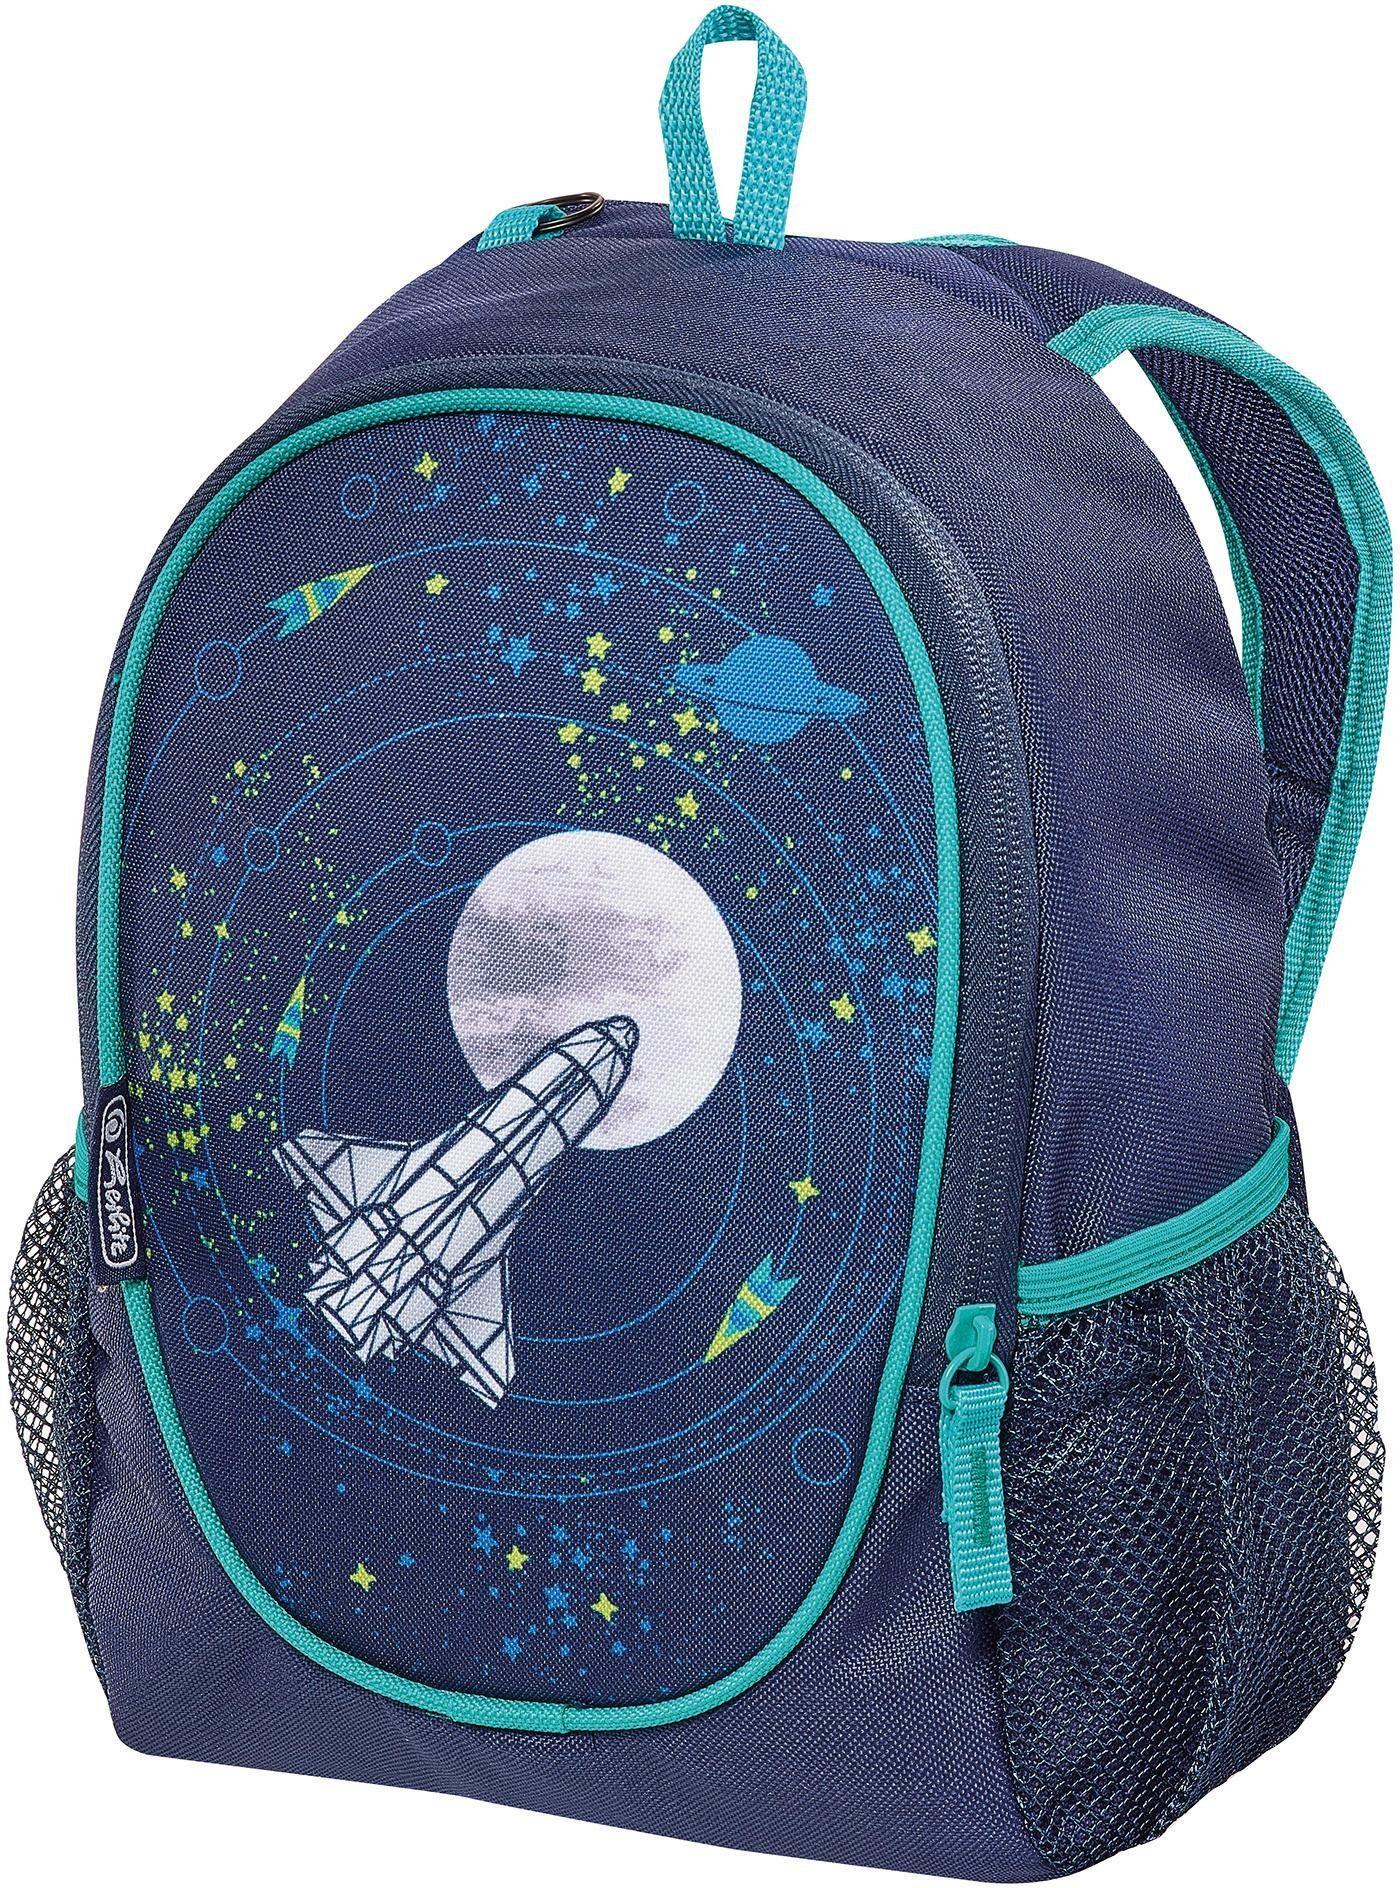 Herlitz Kindergartenrucksack, »Rookie, Space«